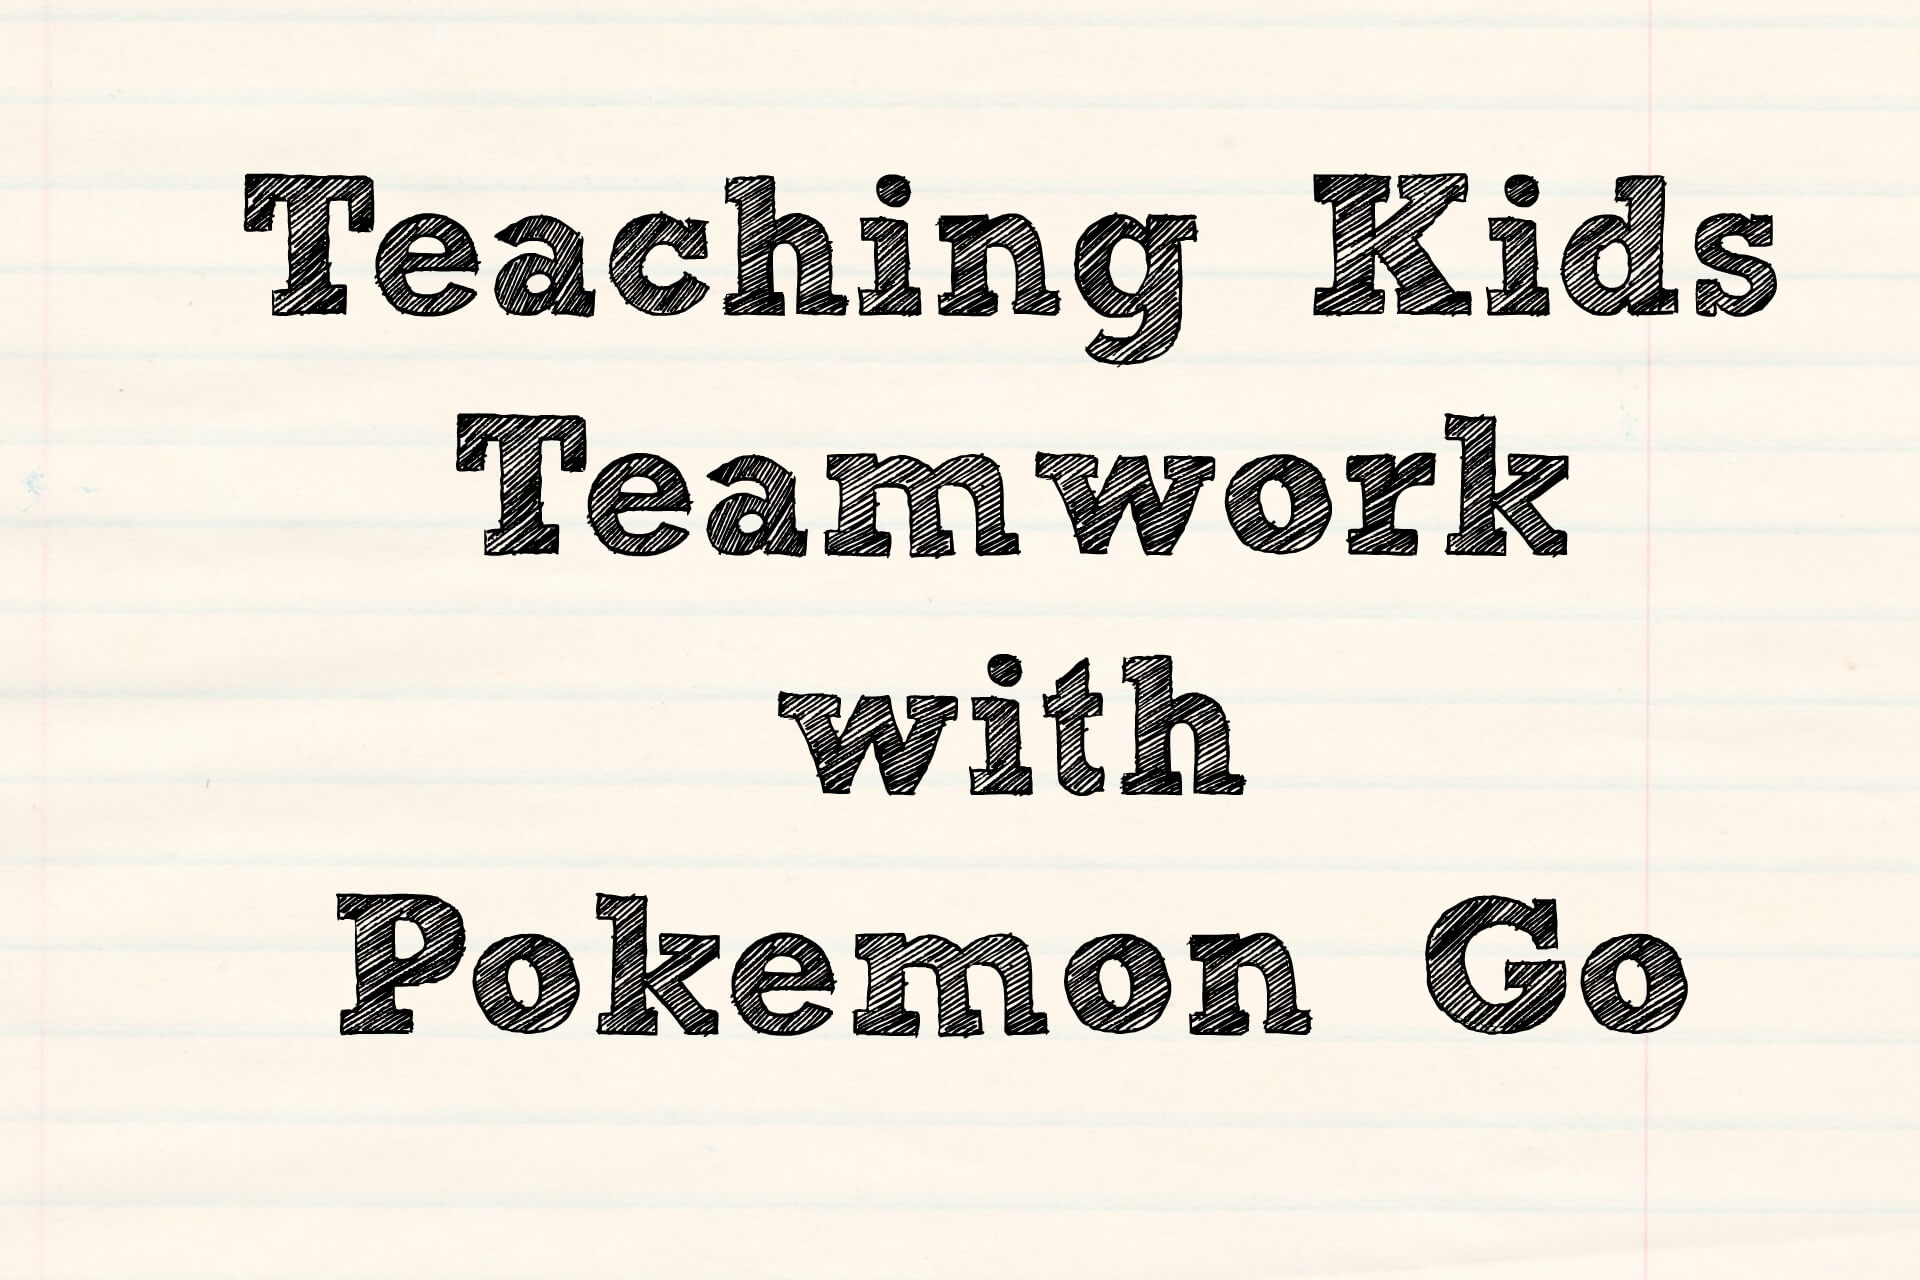 Teamwork with Pokemon Go